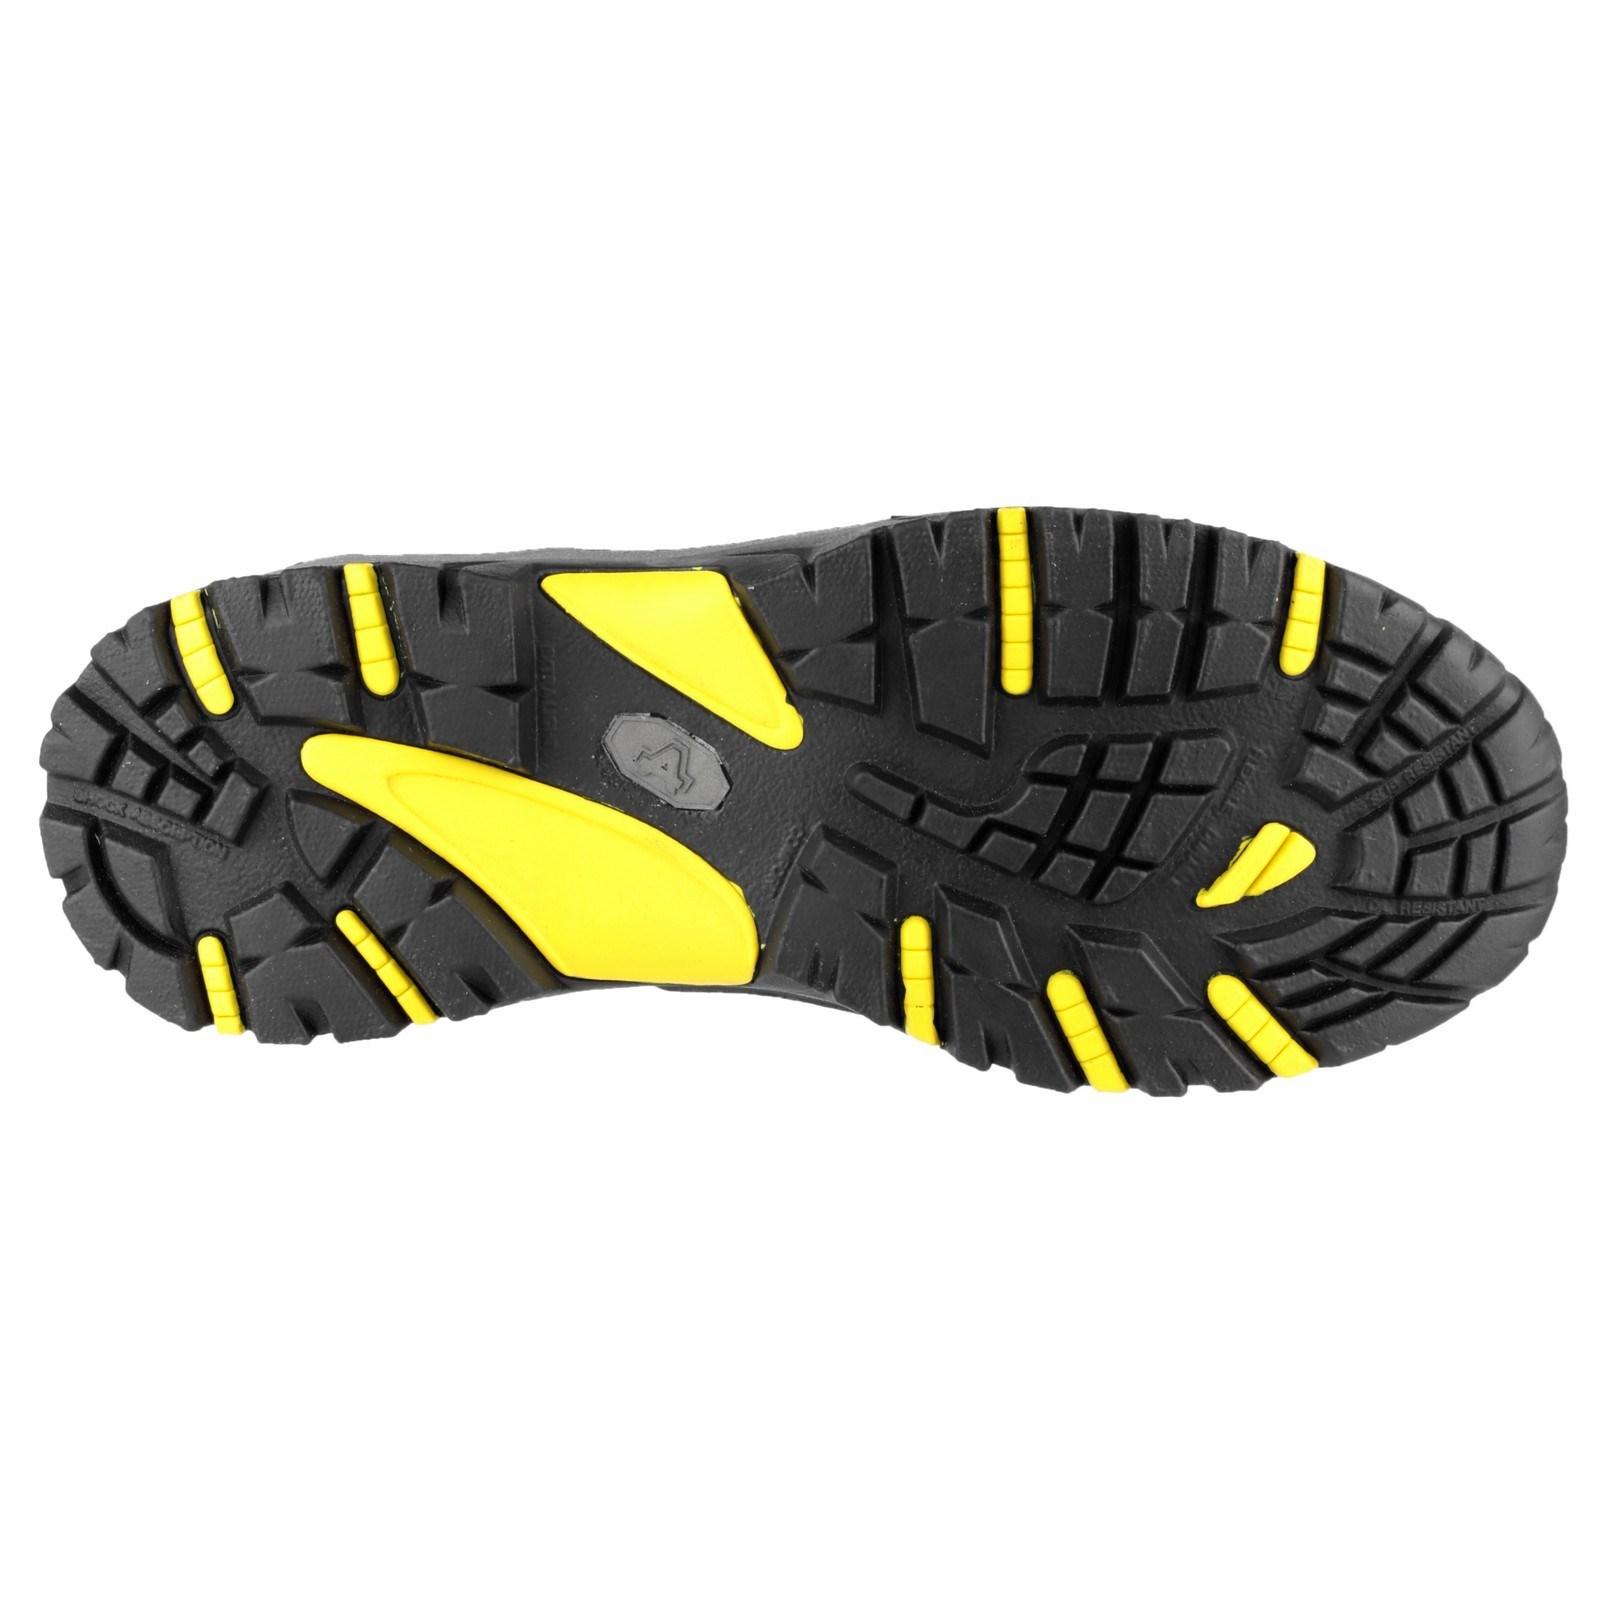 Amblers Seguridad FS32 Impermeable Impermeable Impermeable Bota De Seguridad cómodas con cordones 7e1994